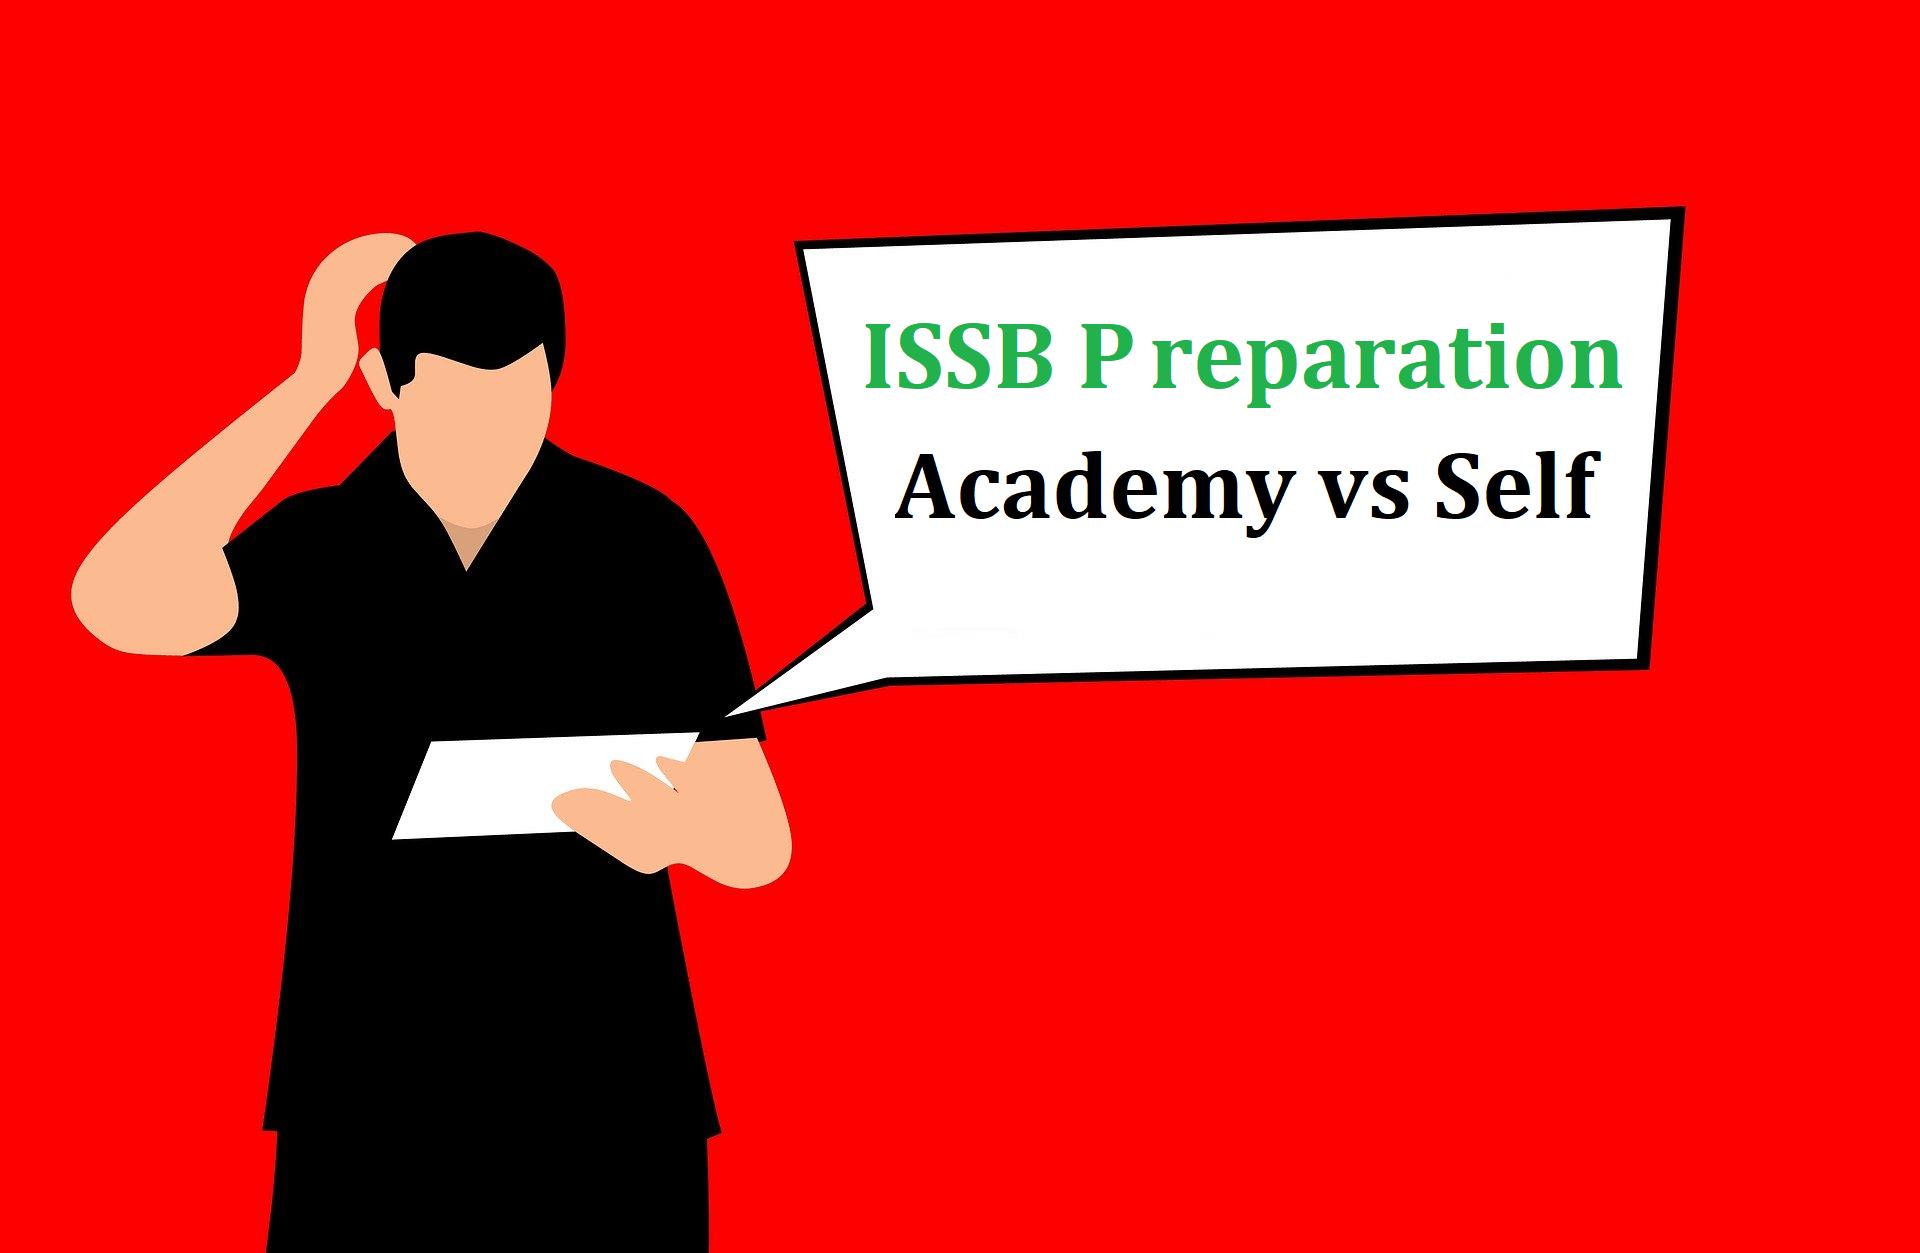 ISSB Test Preparation